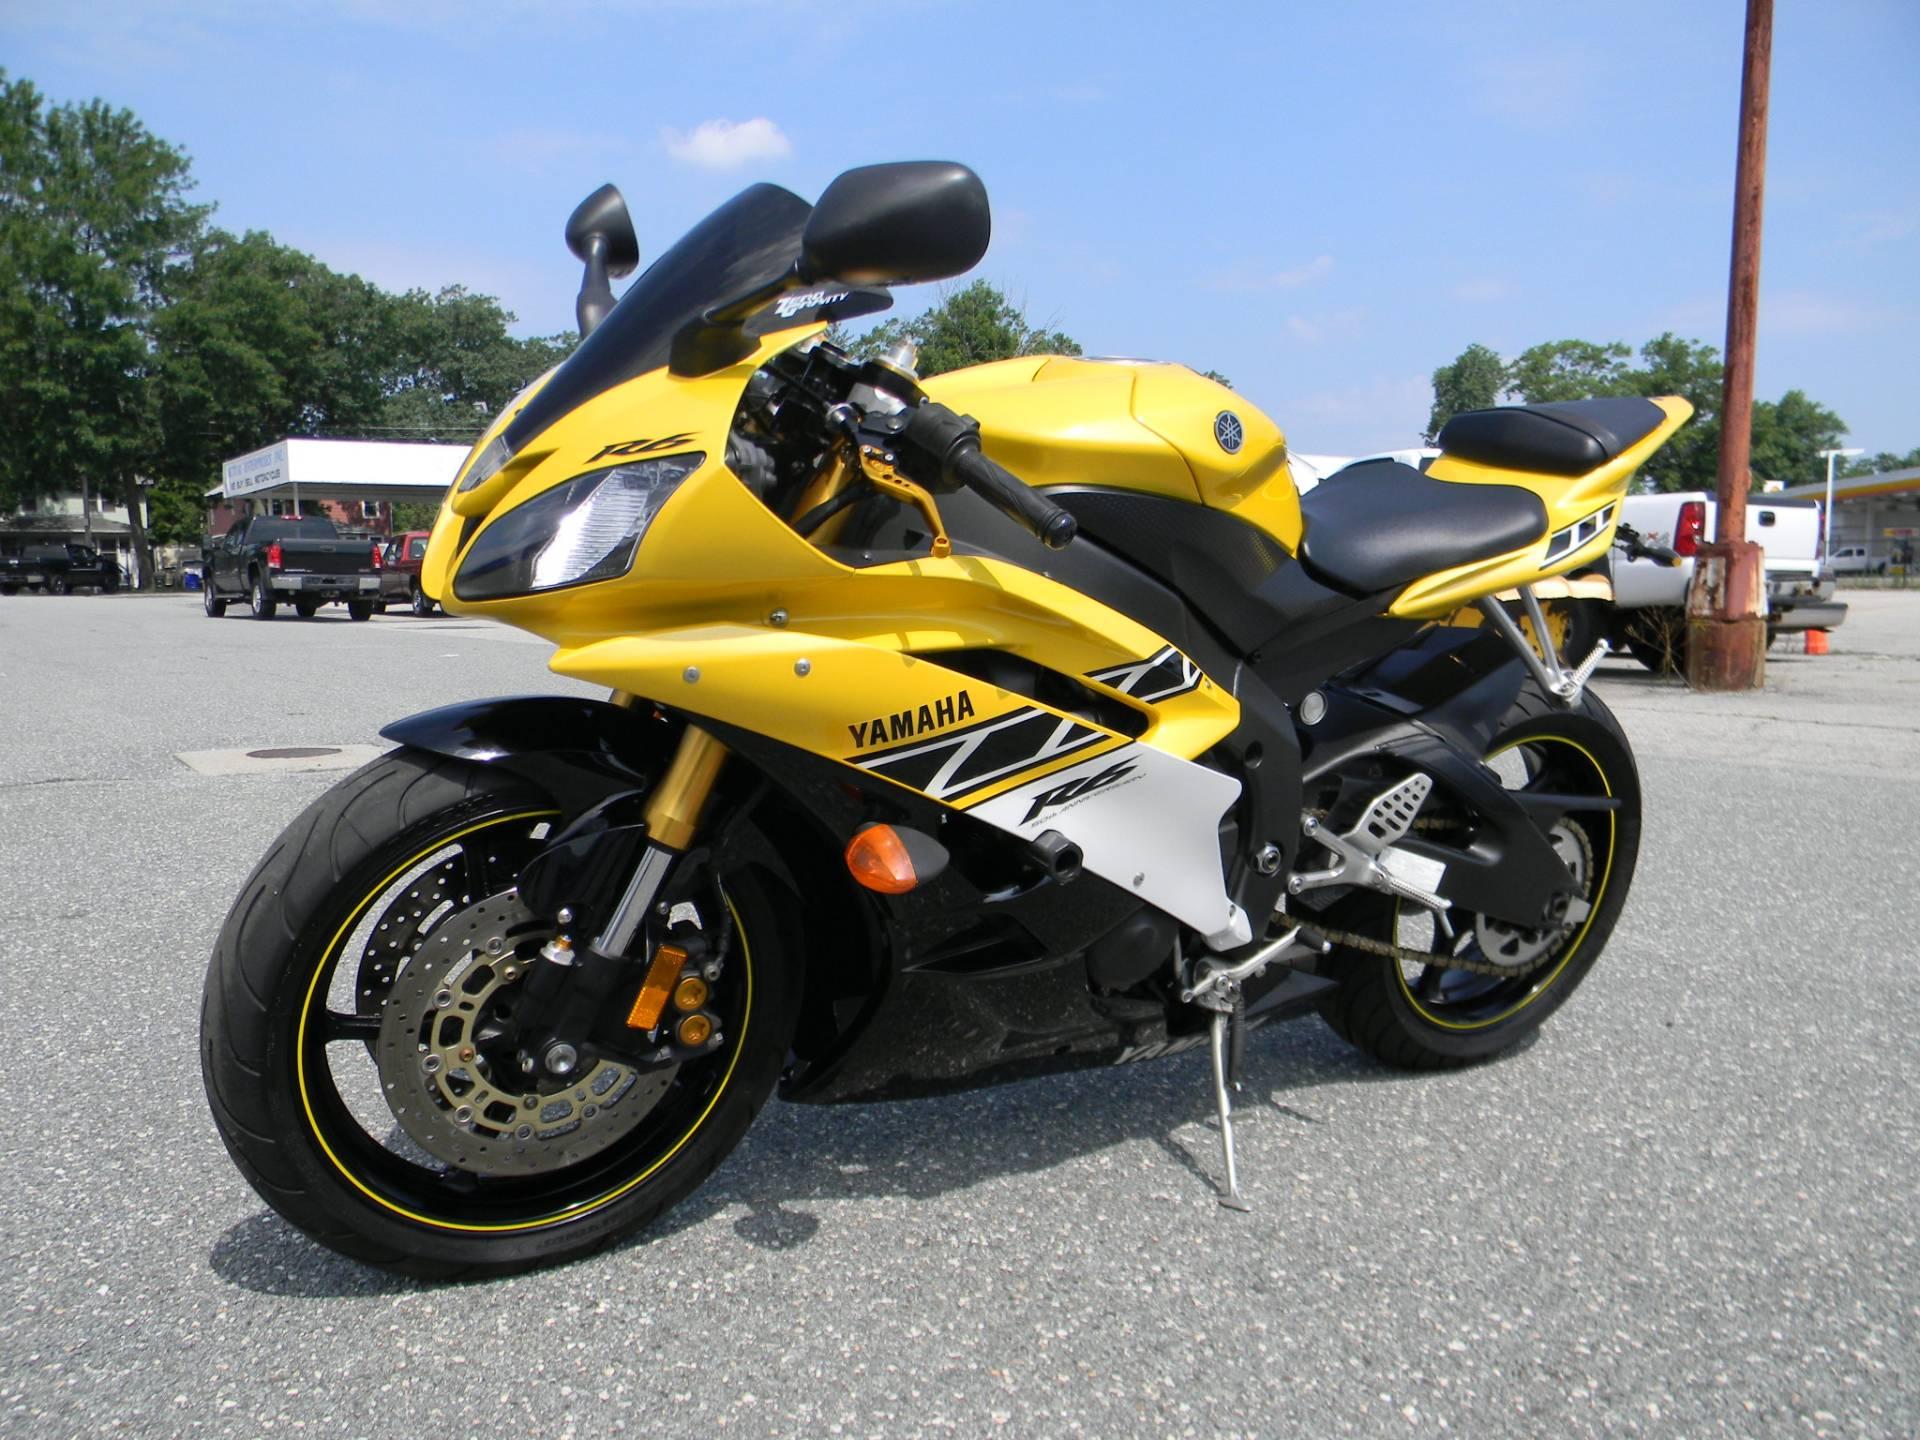 2006 Yamaha YZF-R6 4